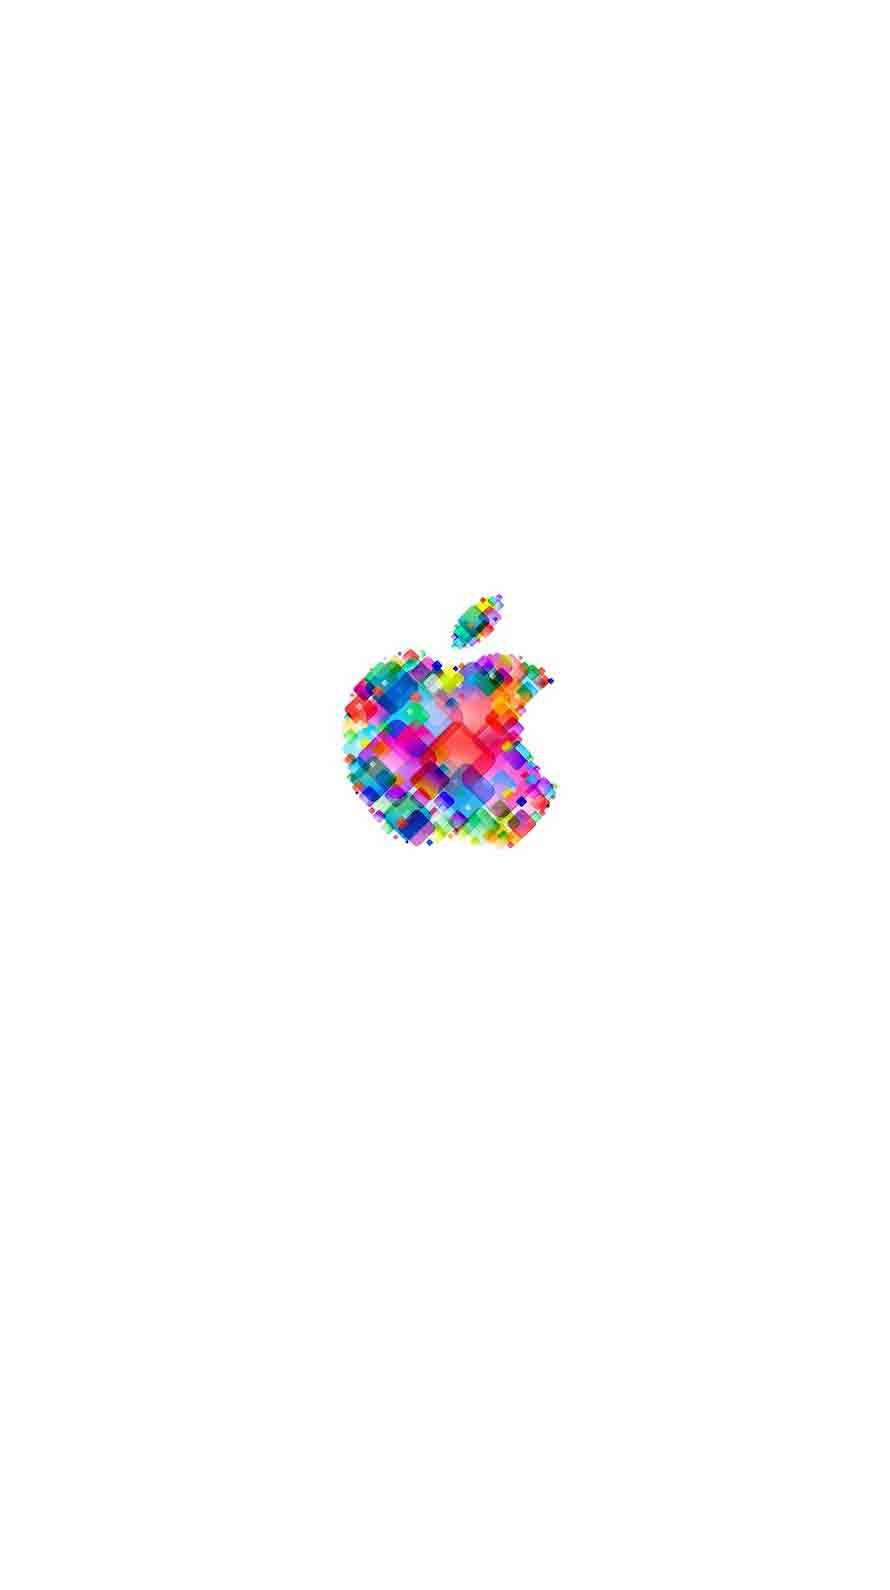 Wallpaper iphone white tumblr - Apple Logo Pop Colorful White Wallpaper Sc Iphone6